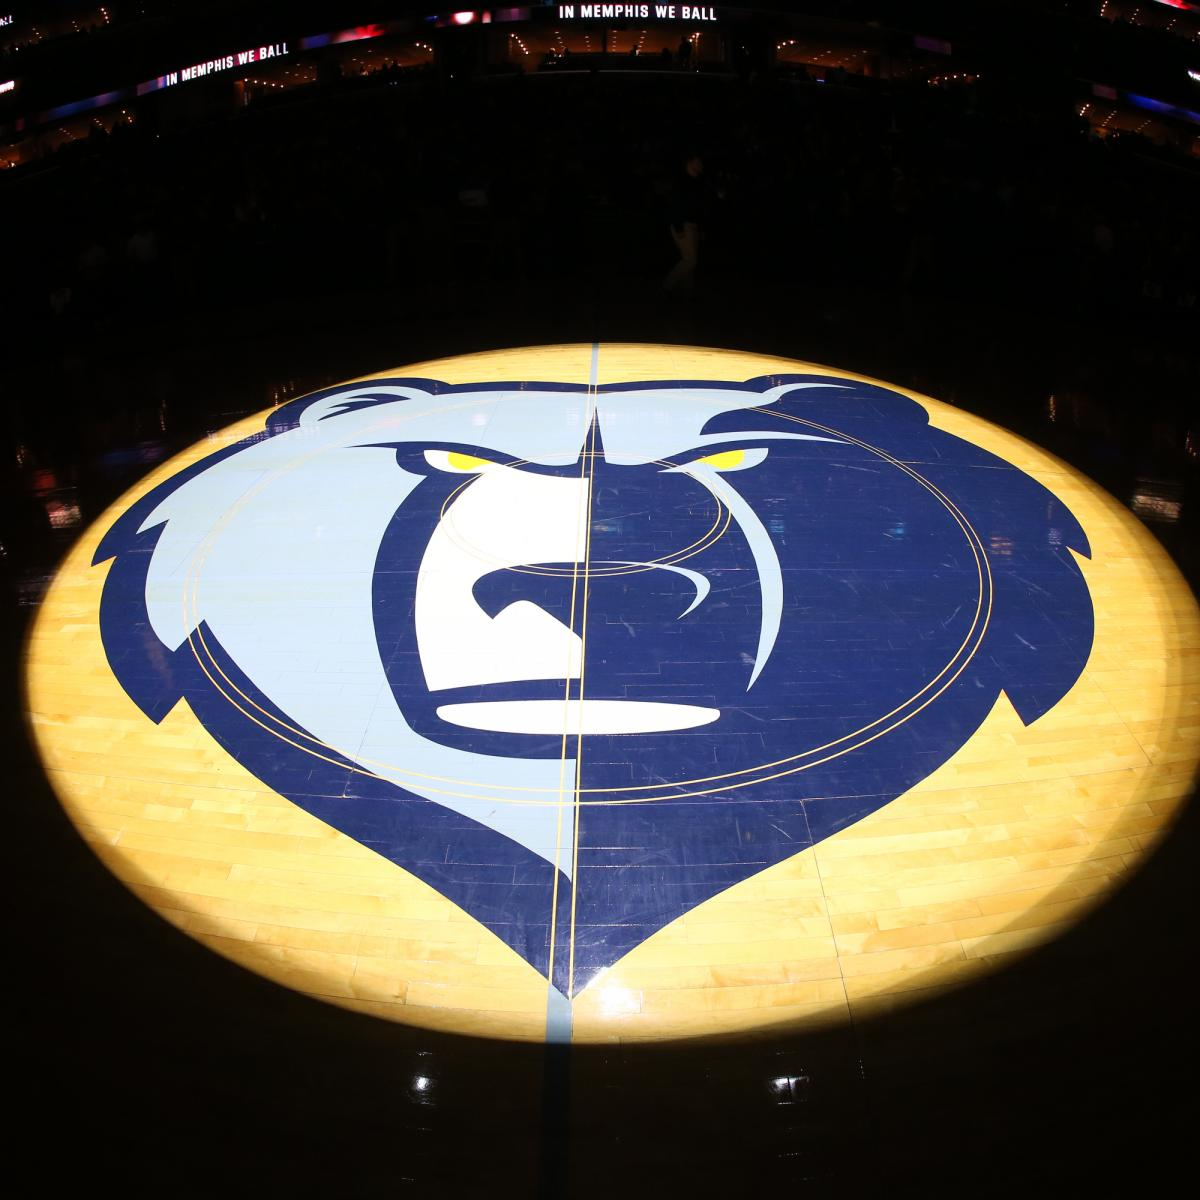 Nuggets Quarter Season Tickets: 2018 NBA Draft Trade Rumors: Knicks, Celtics Among Suitors